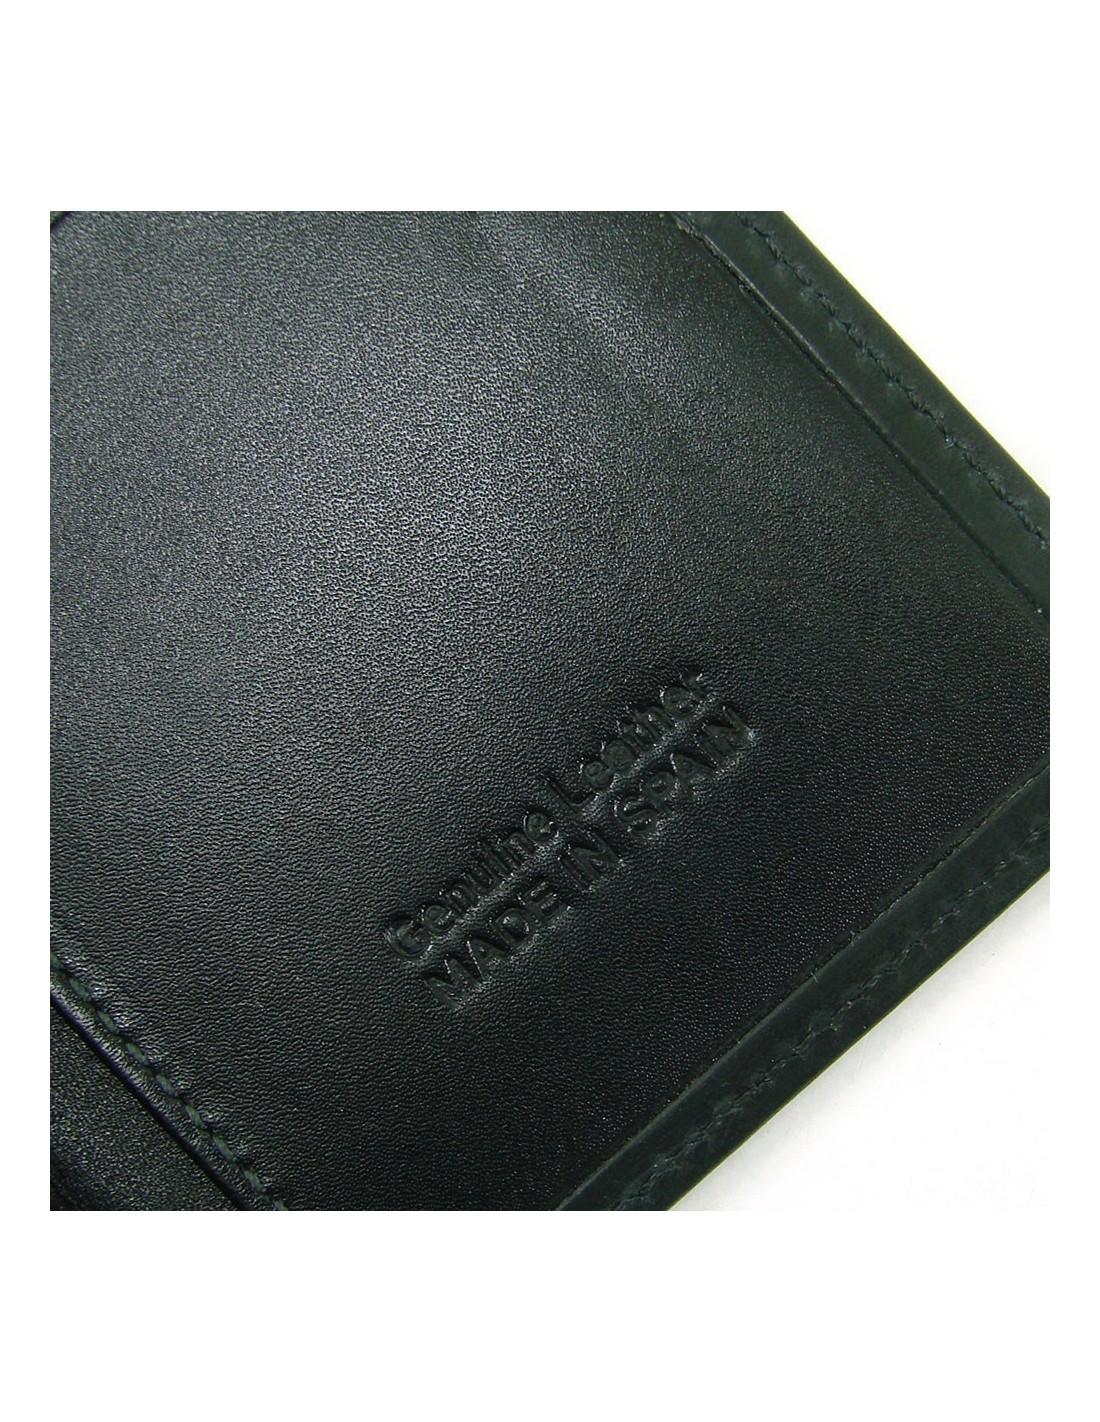 495f9e30a Mini cartera monedero para hombre de piel negro